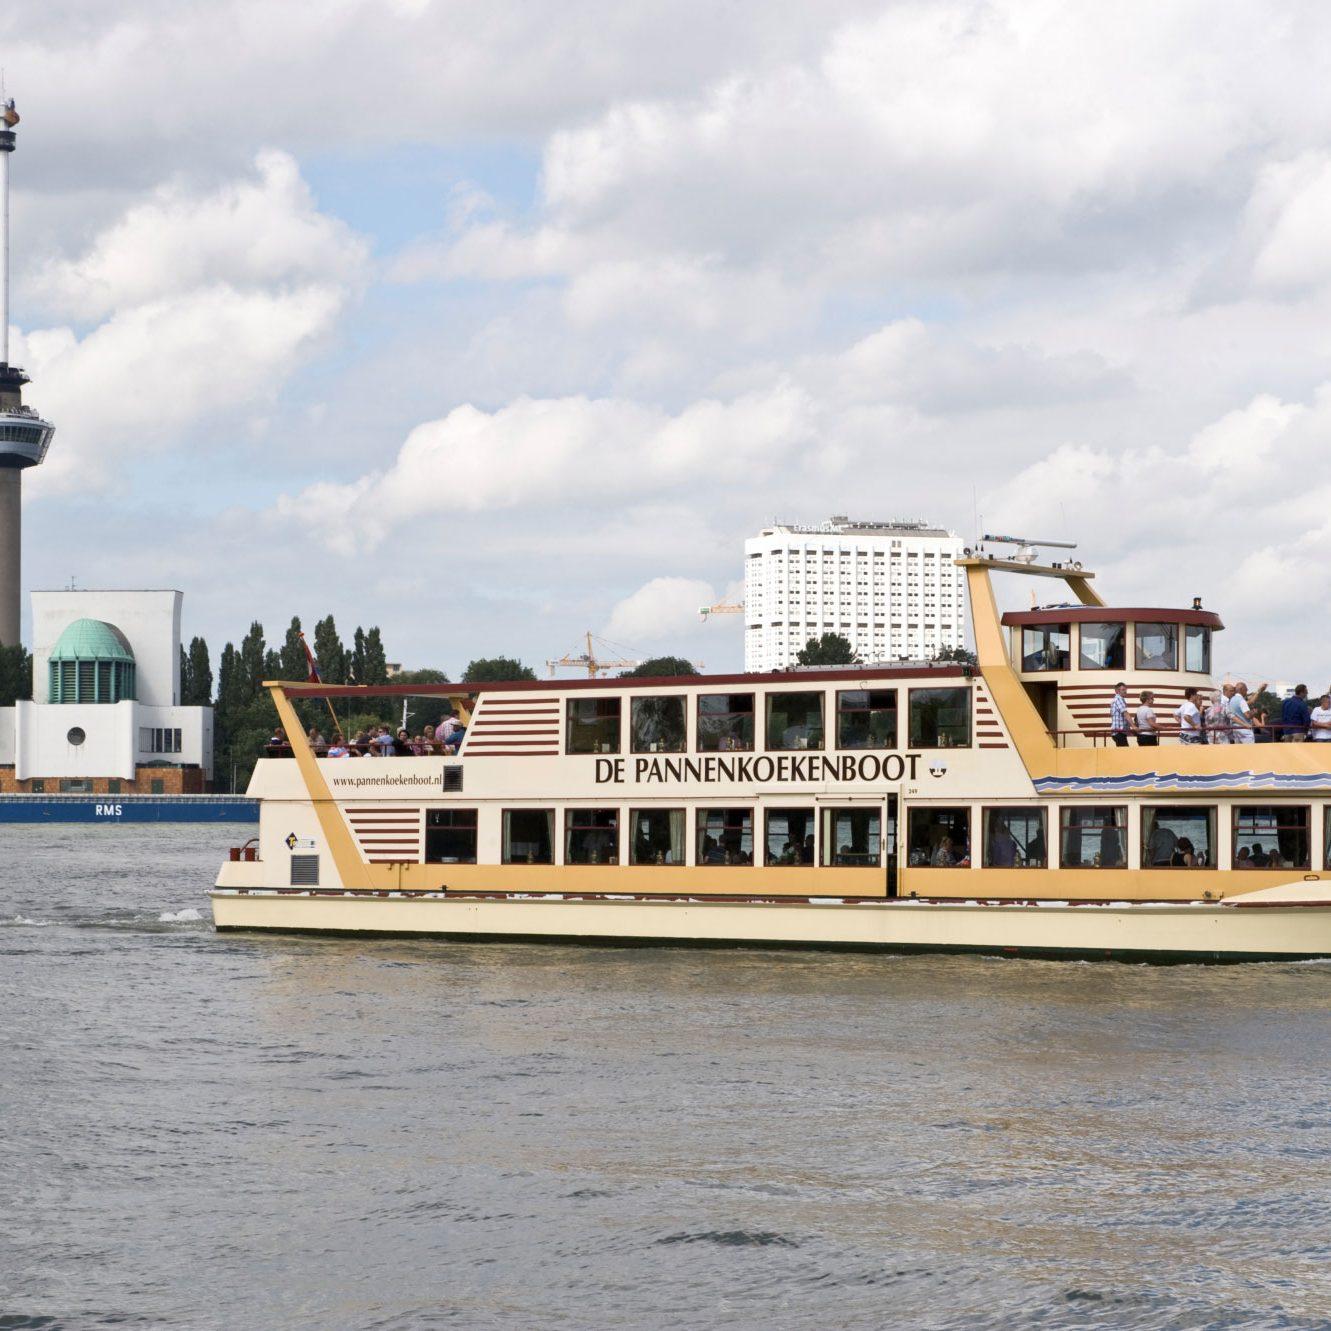 Pannenkoekenboot_Rotterdam